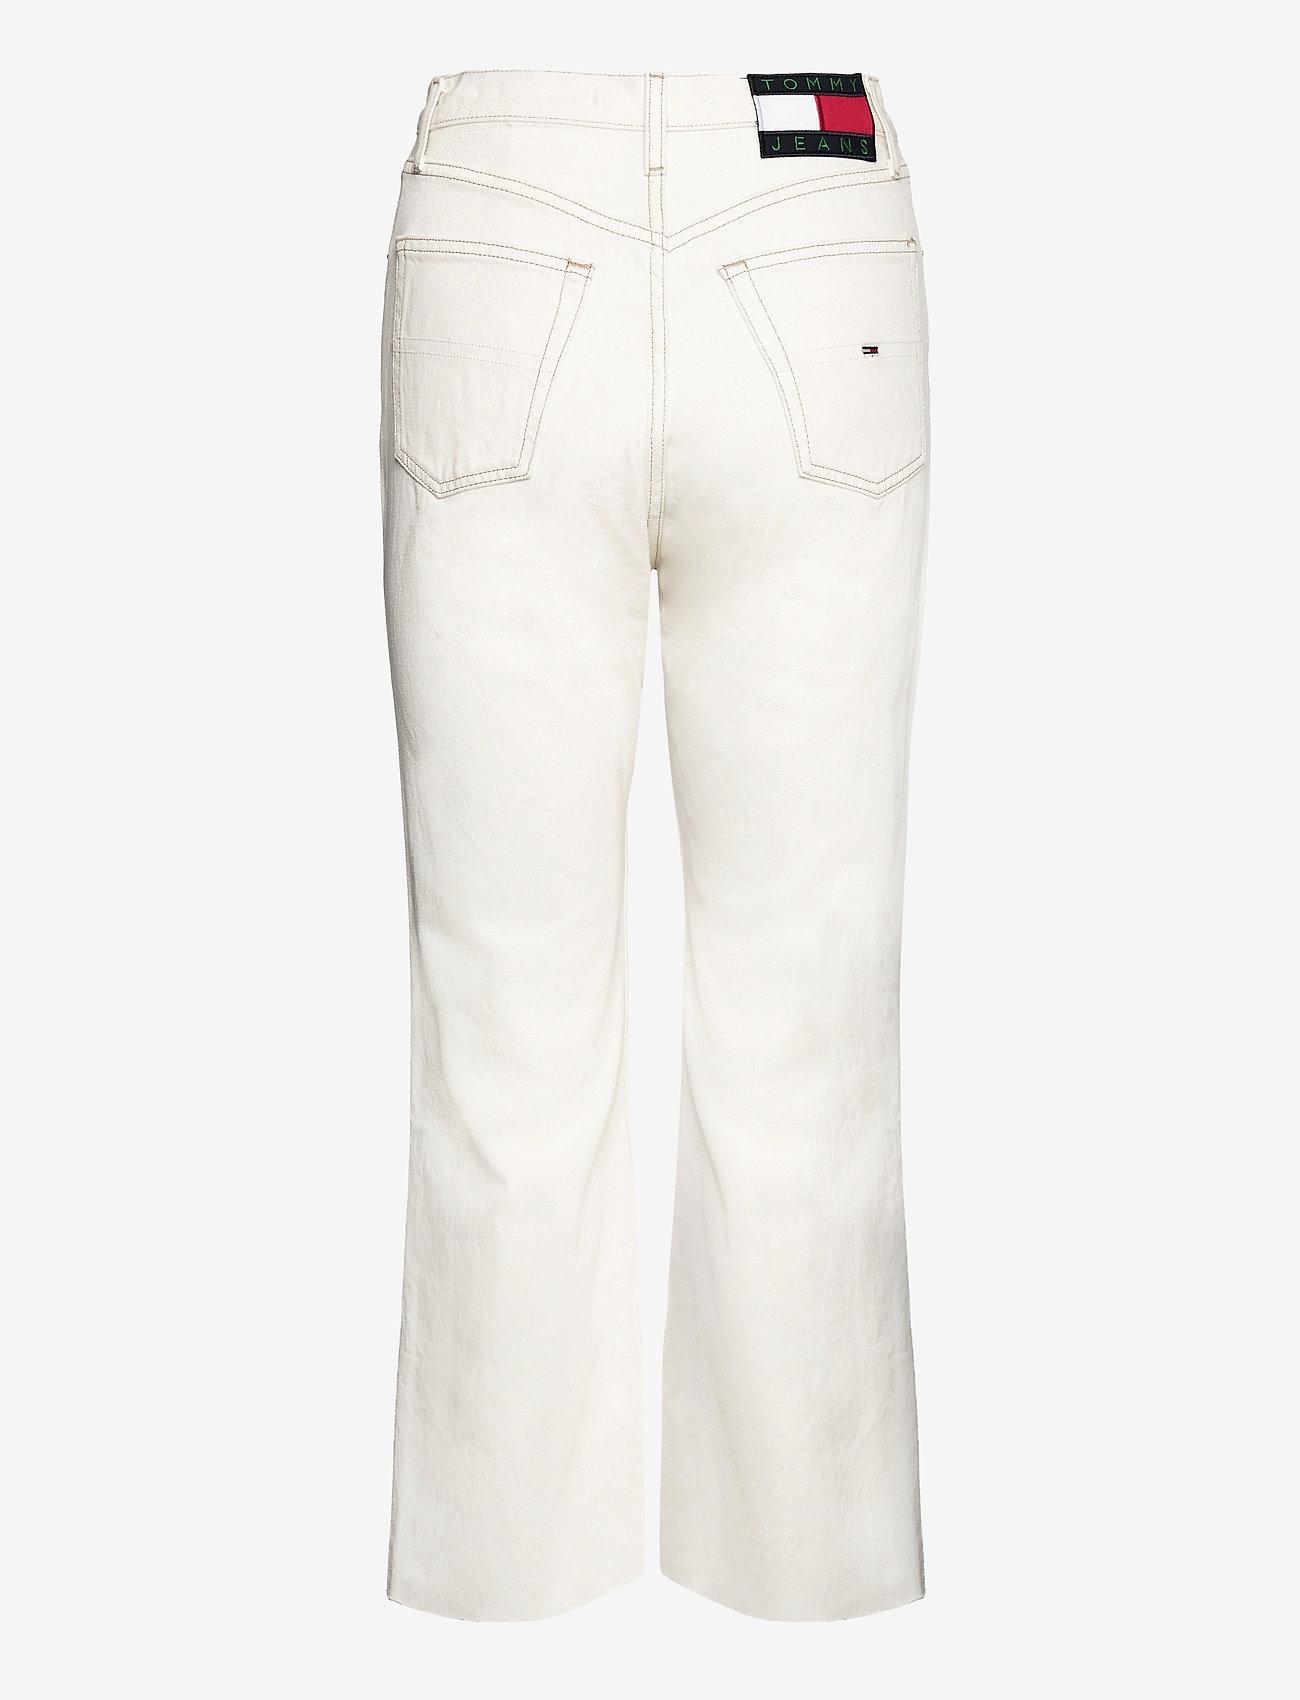 Tommy Jeans - HARPER HR FLARE ANKLE BF SSPWR - schlaghosen - save sp white rgd - 1